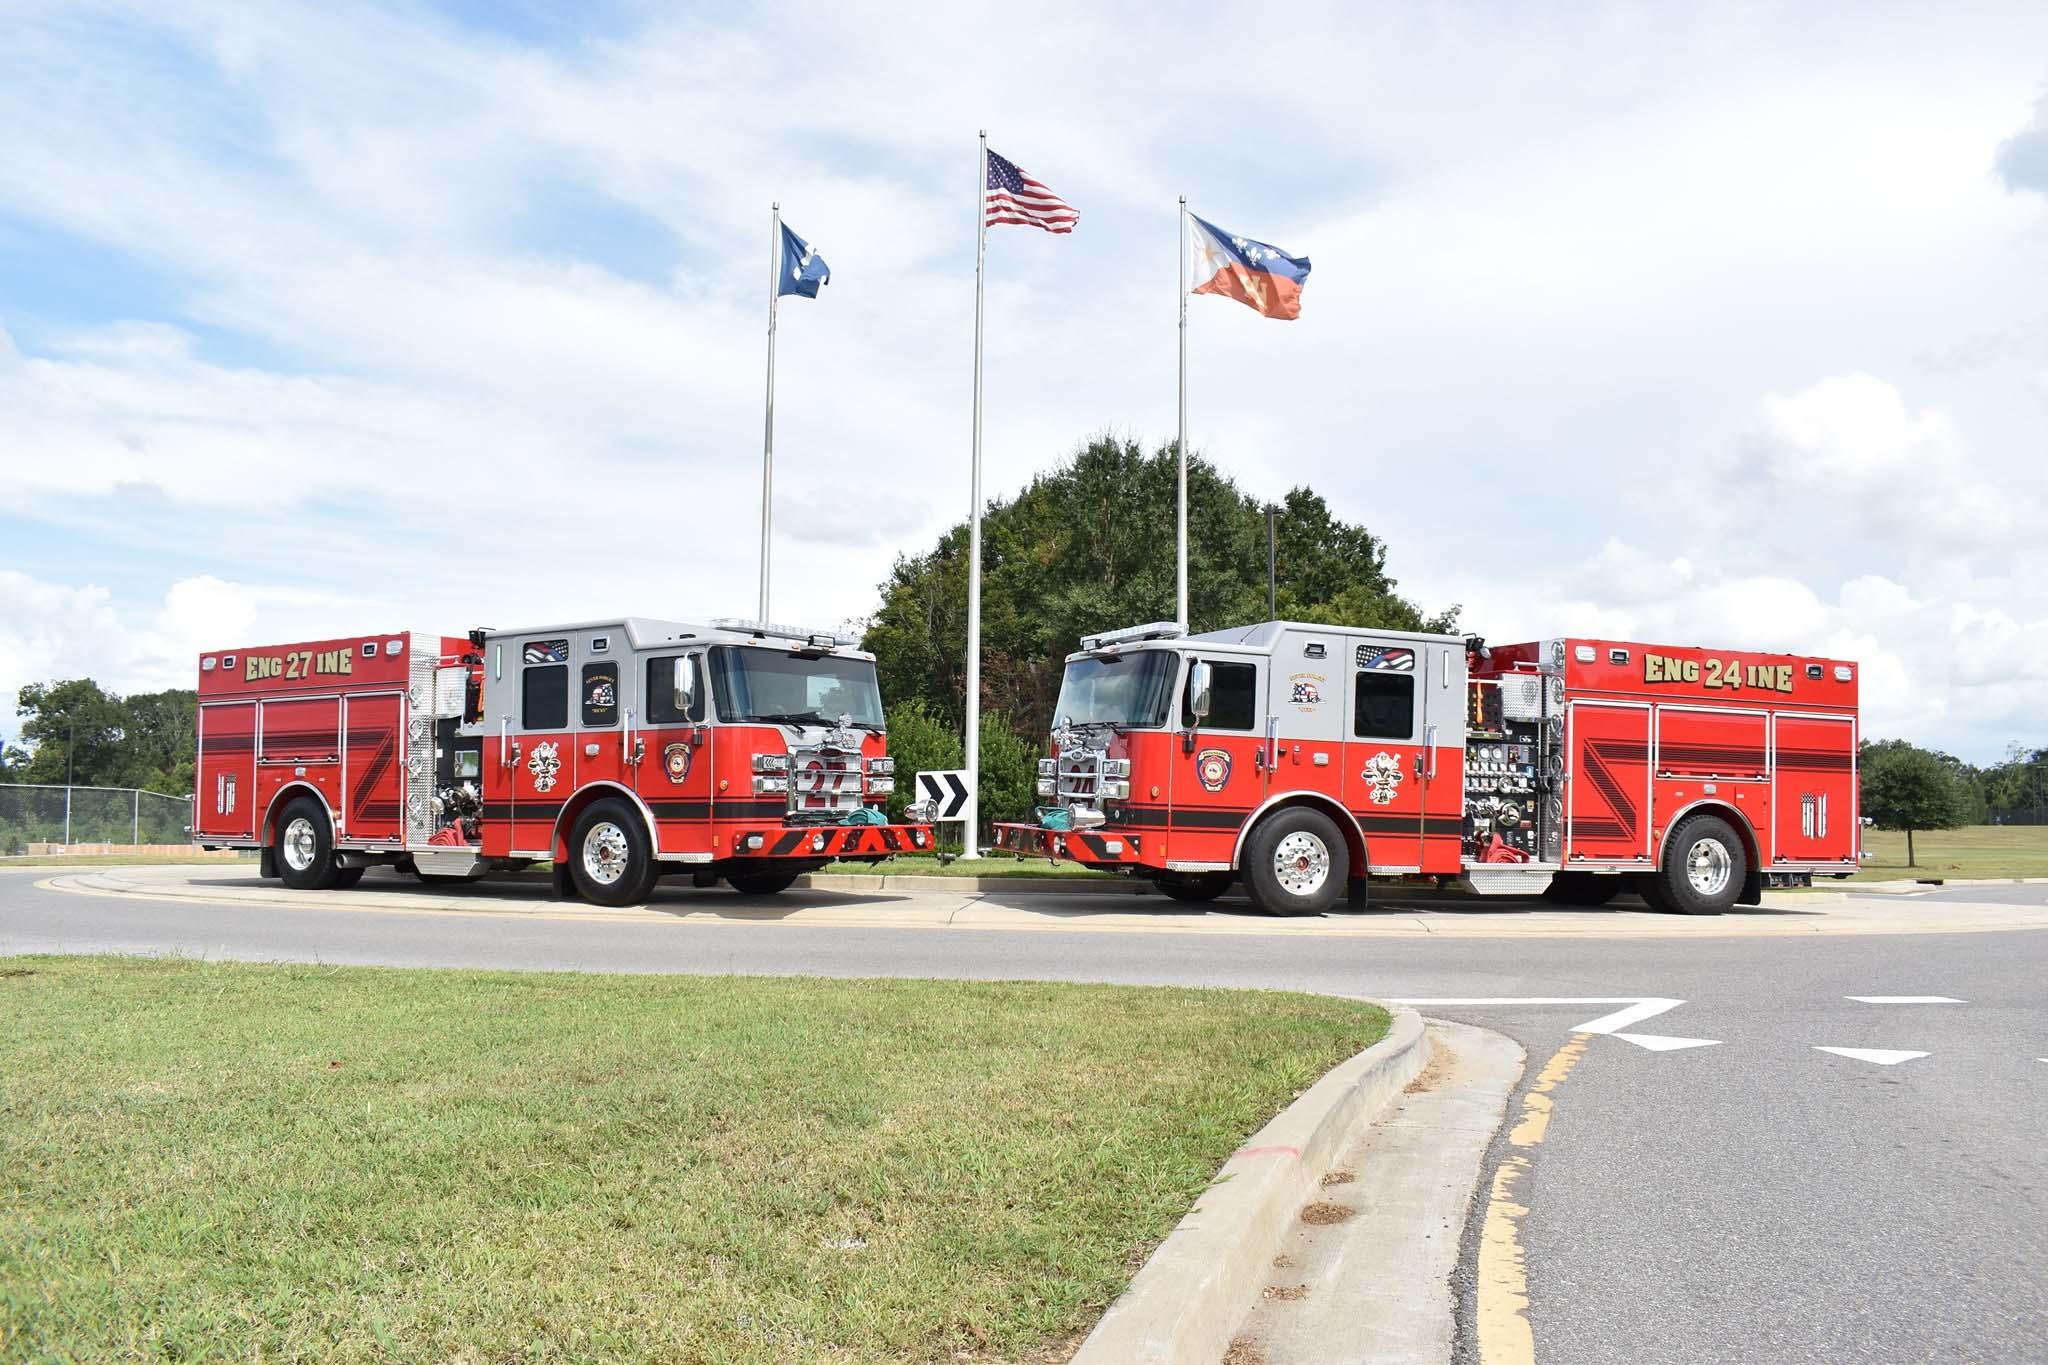 Broussard (LA) Fire Department Dedicates Two New Trucks to Fallen Heroes